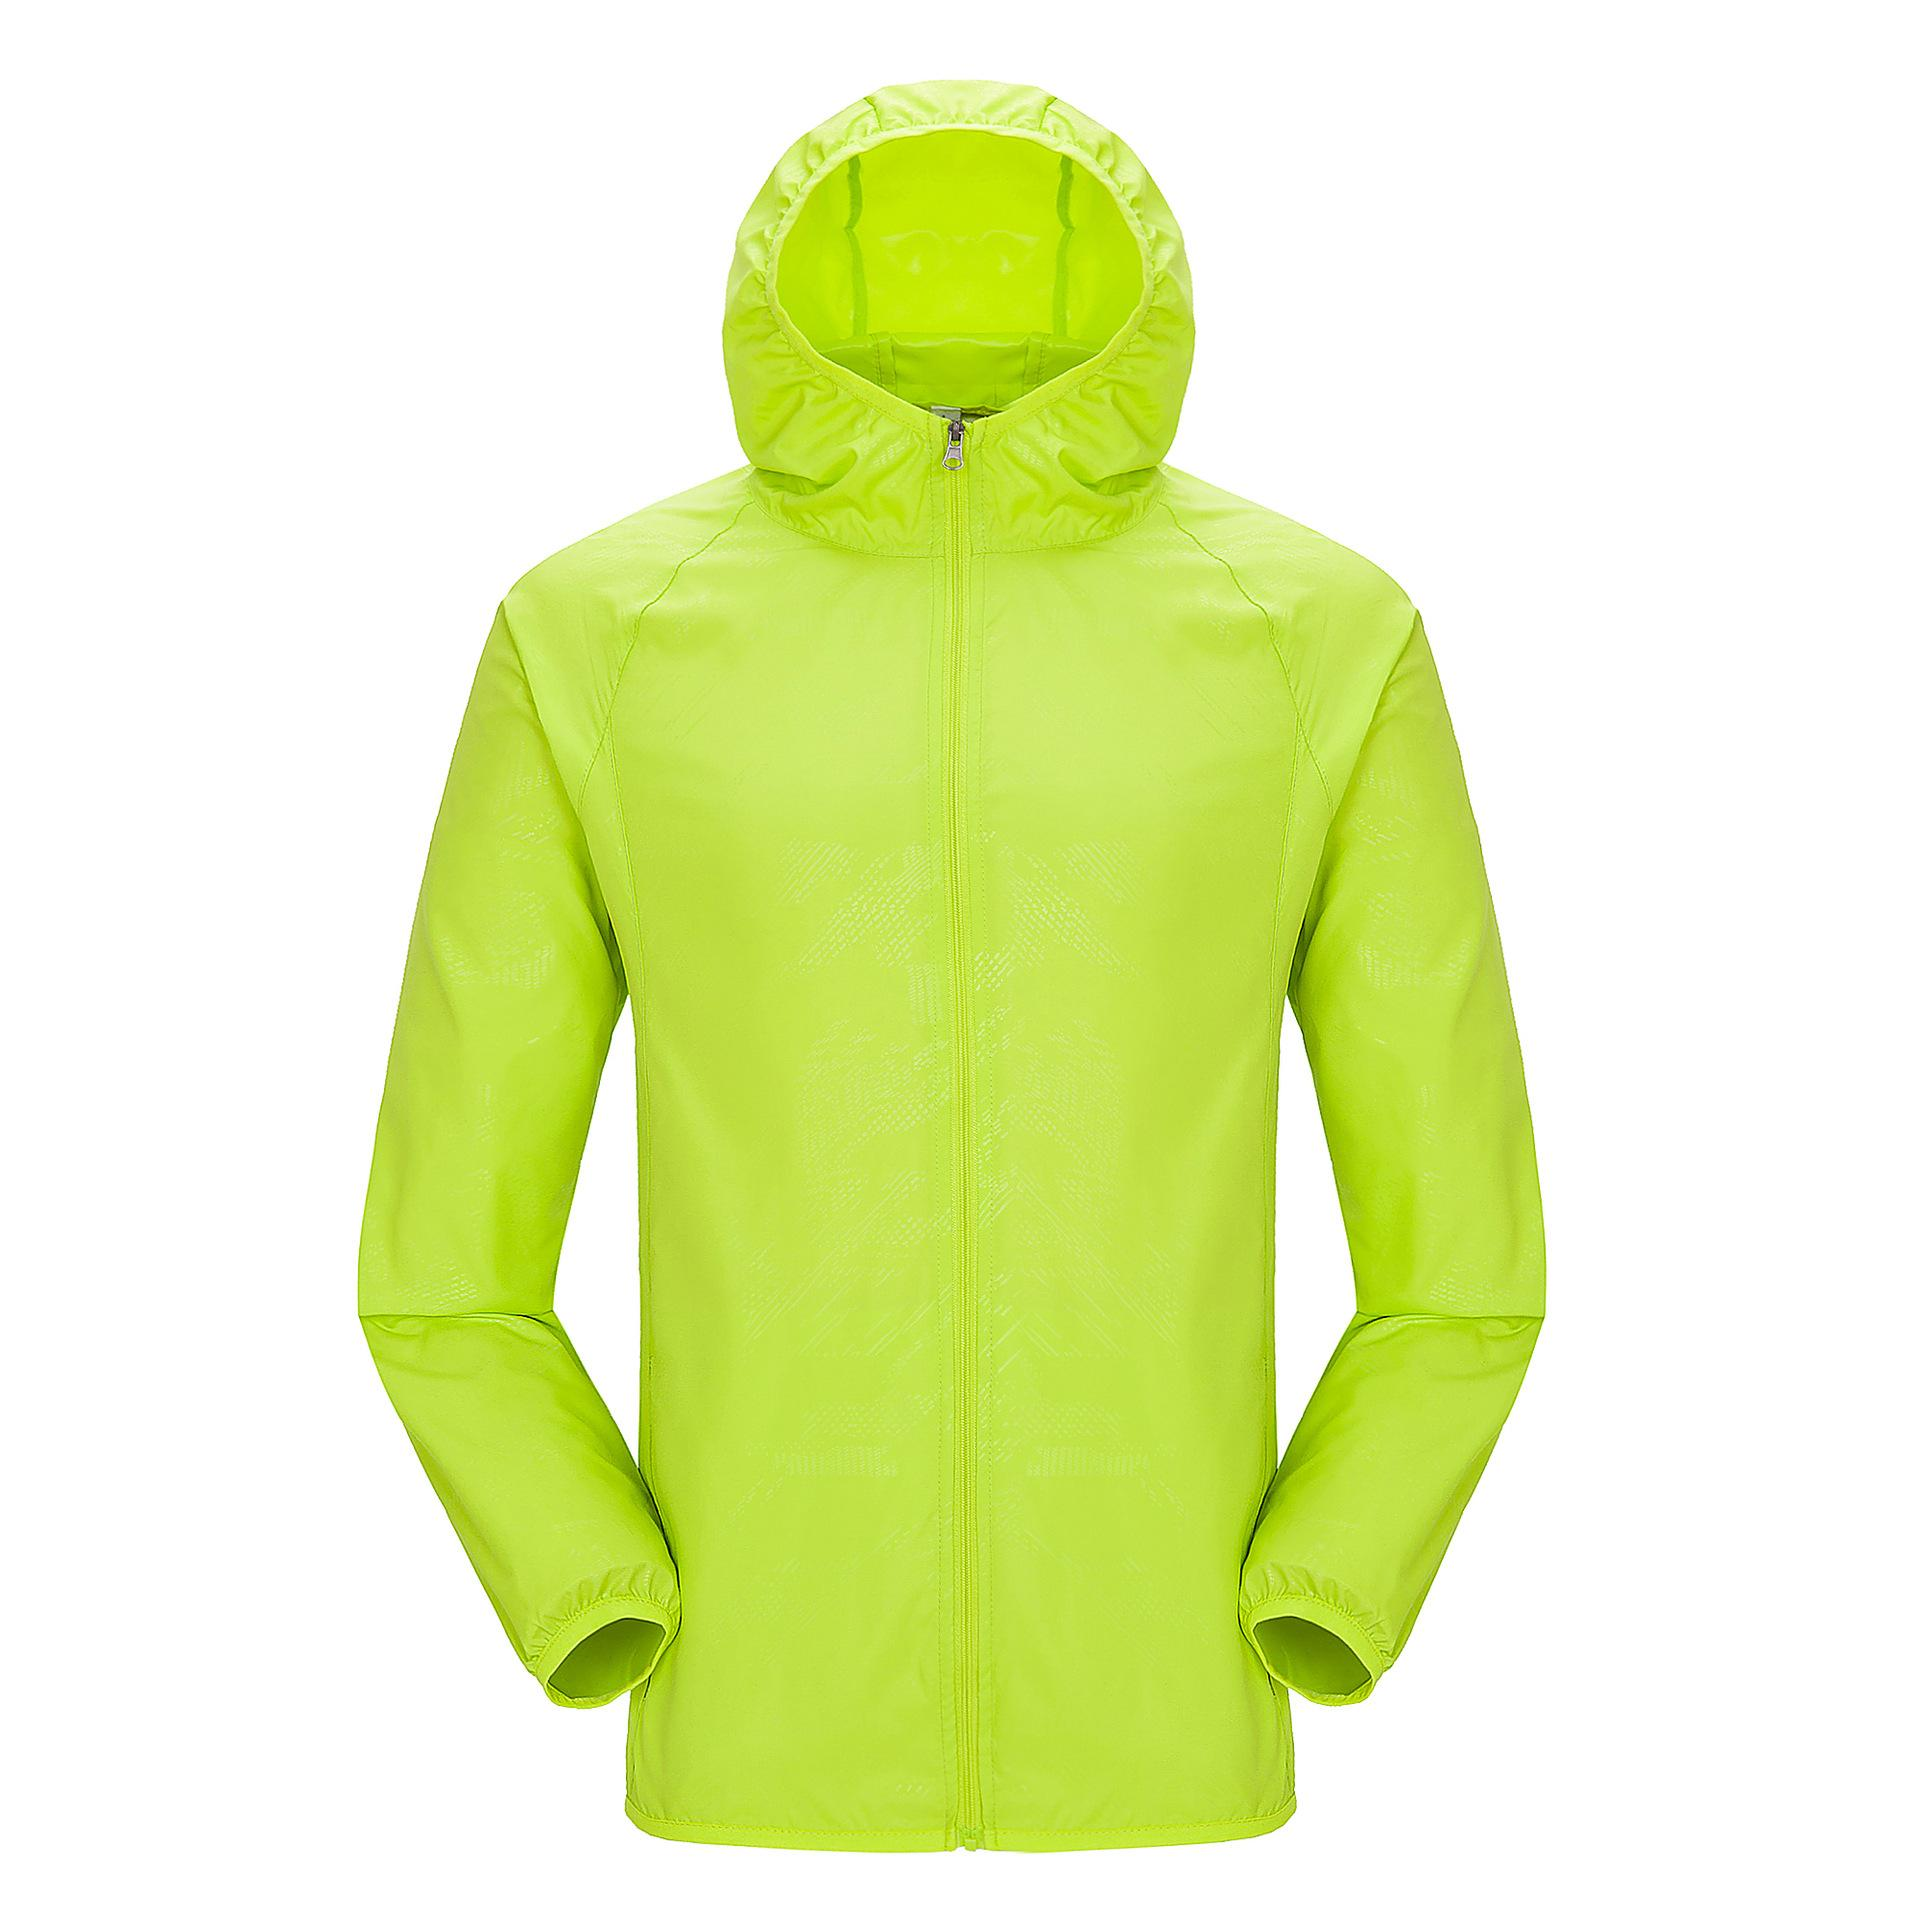 2019 Outdoor Sports Trench Coat Men And Women Waterproof Sun Protection Clothing Beach Thin Coat Customizable Logo